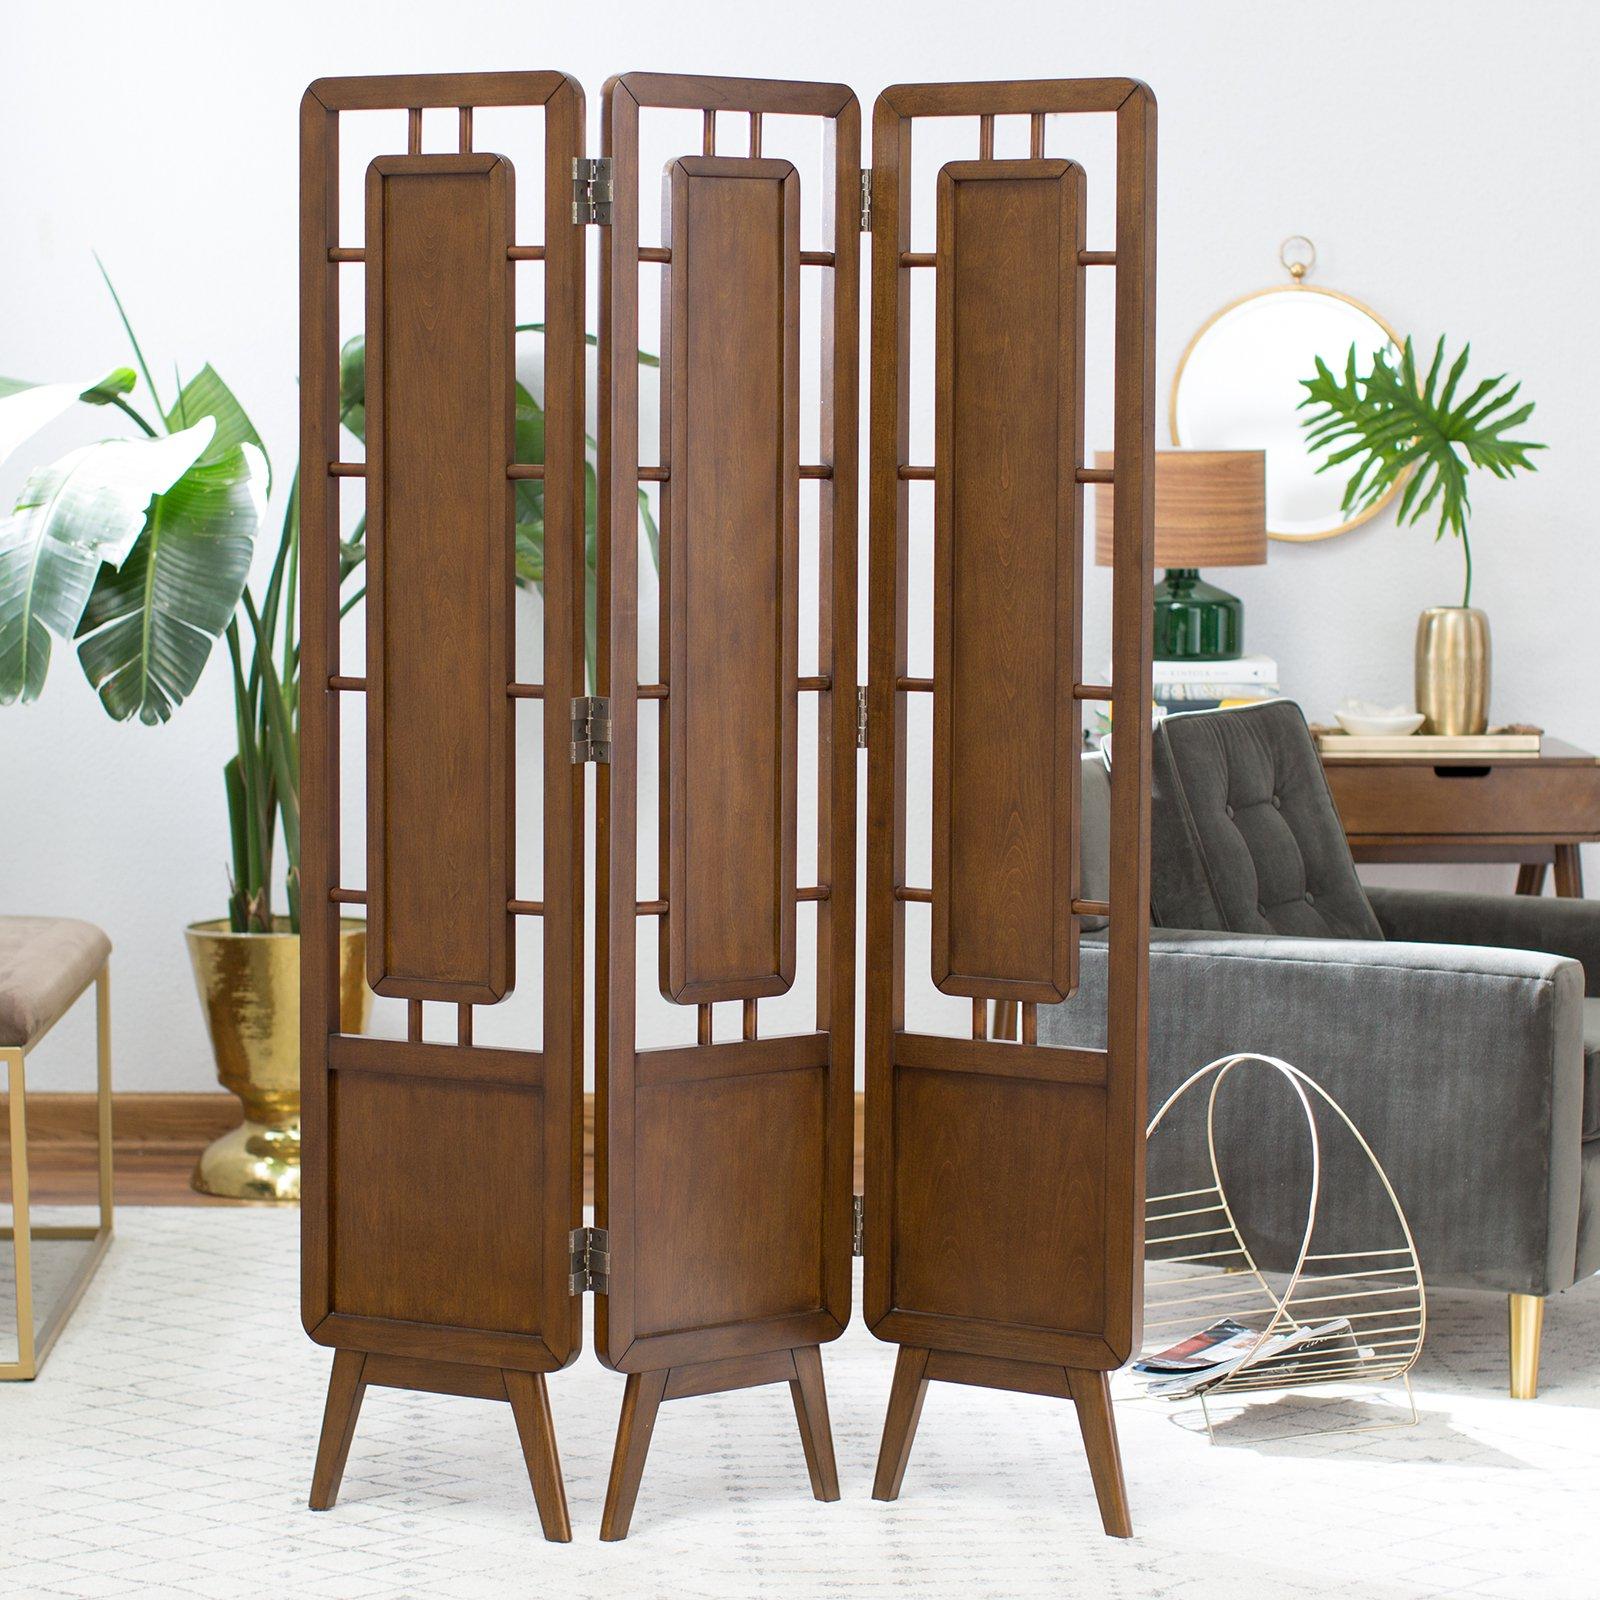 Belham Living Carter Mid Century Modern 3-Panel Room Divider